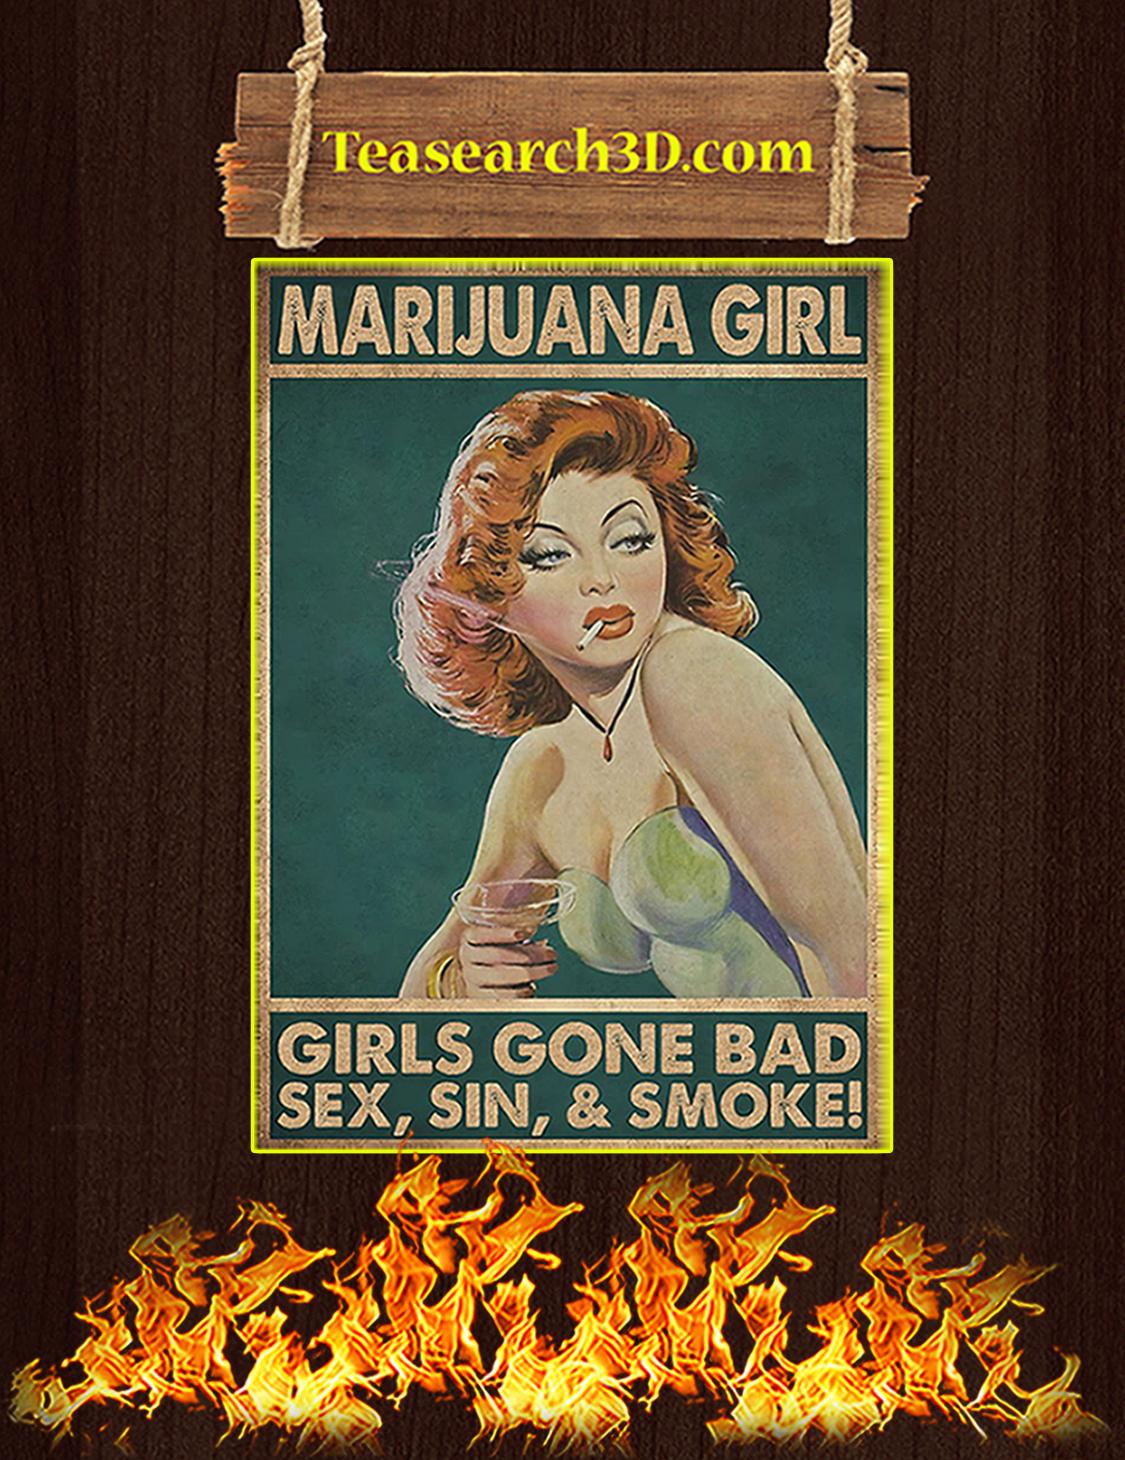 Marijuana girl girls gone bad sex sin and smoke poster A3